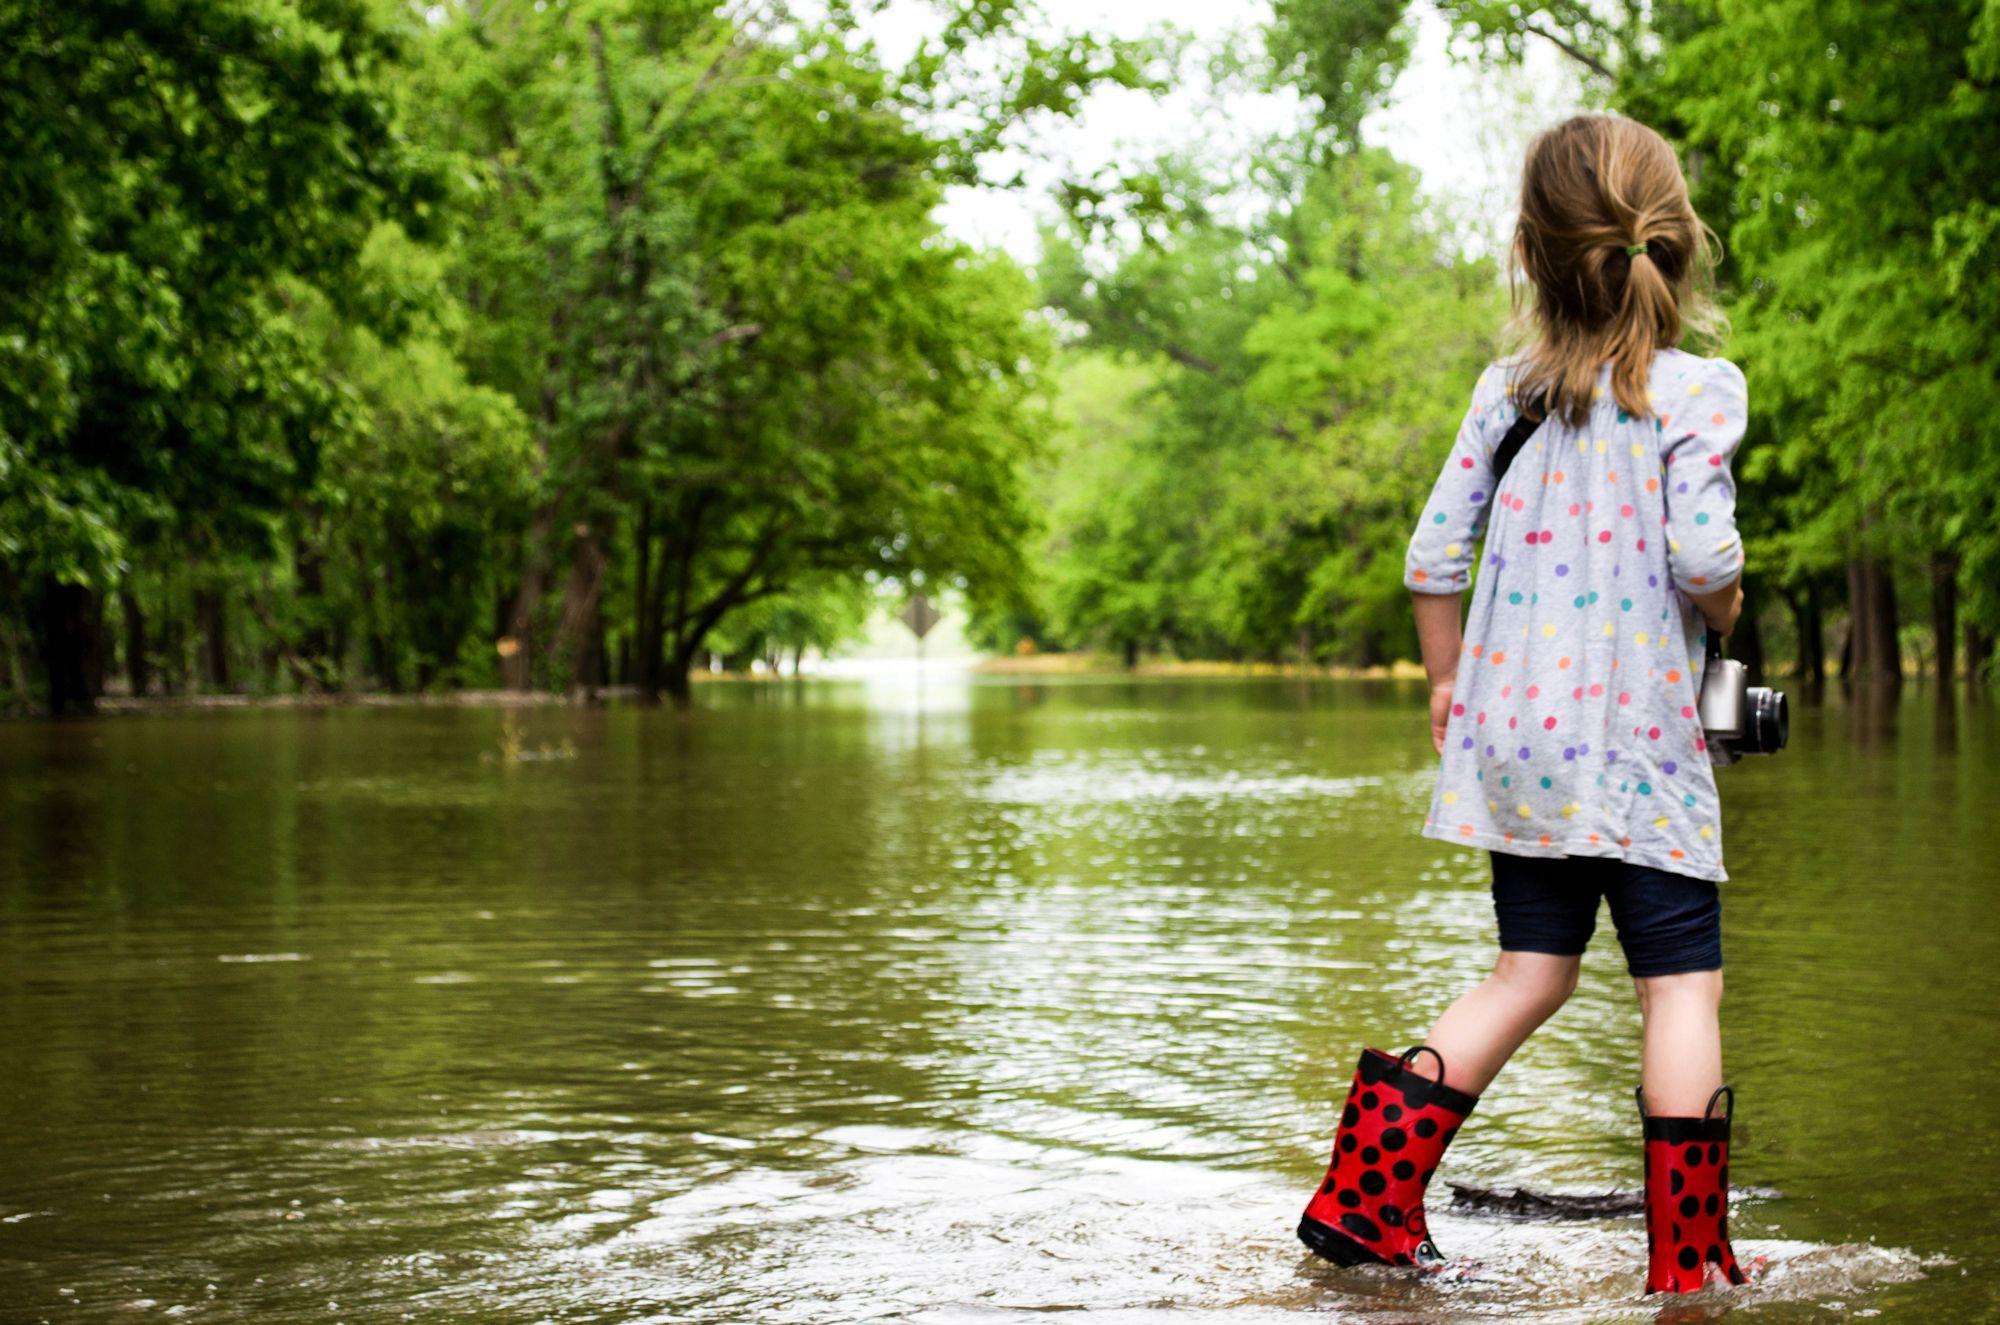 Girl Standing in Flood Waters